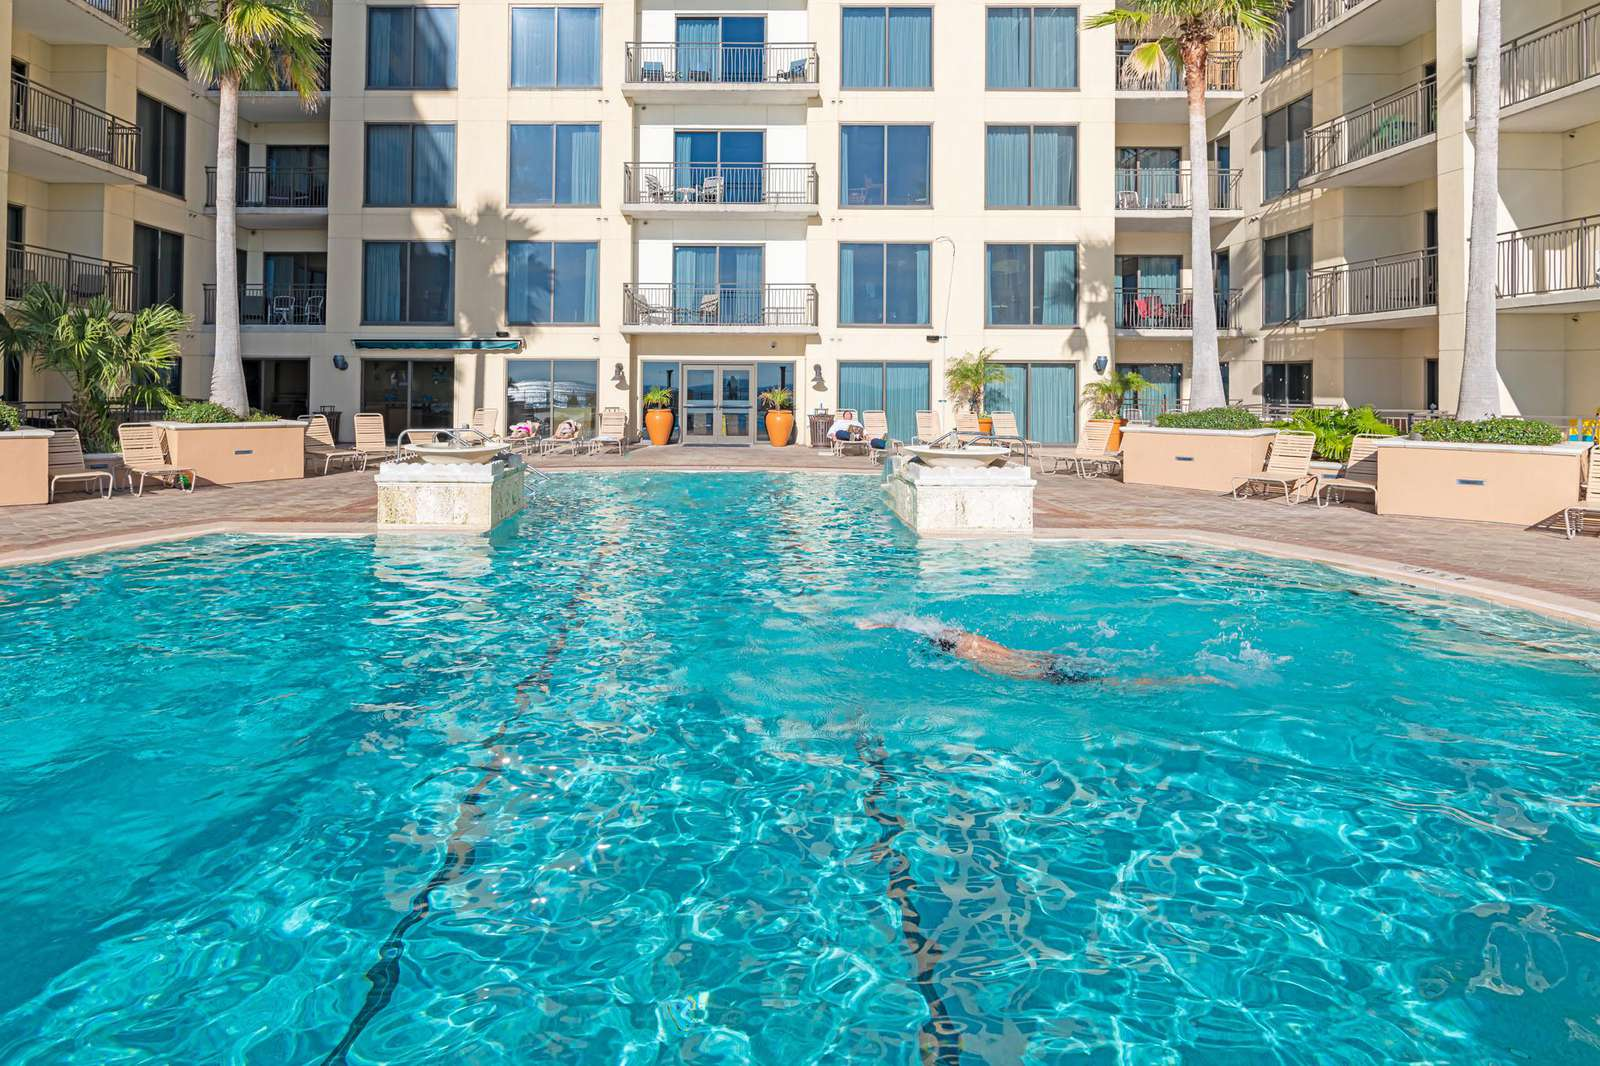 Large seasonally heated onsite pool with views!